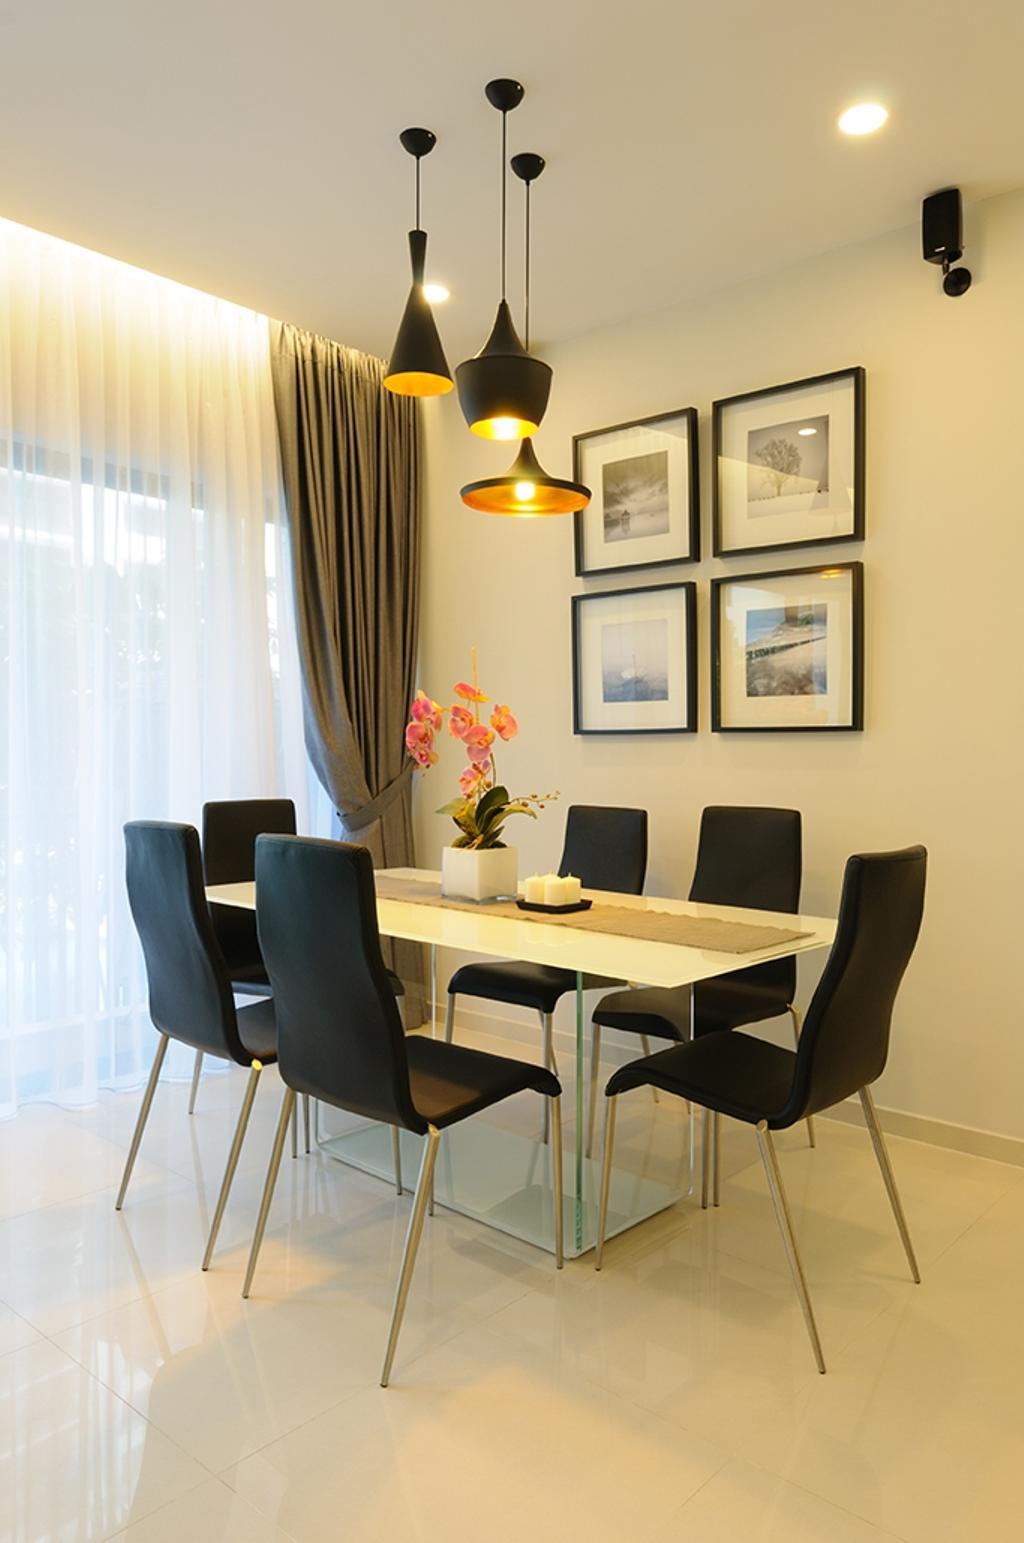 Qanvast | Home Design, Renovation, Remodelling & Furnishing Ideas